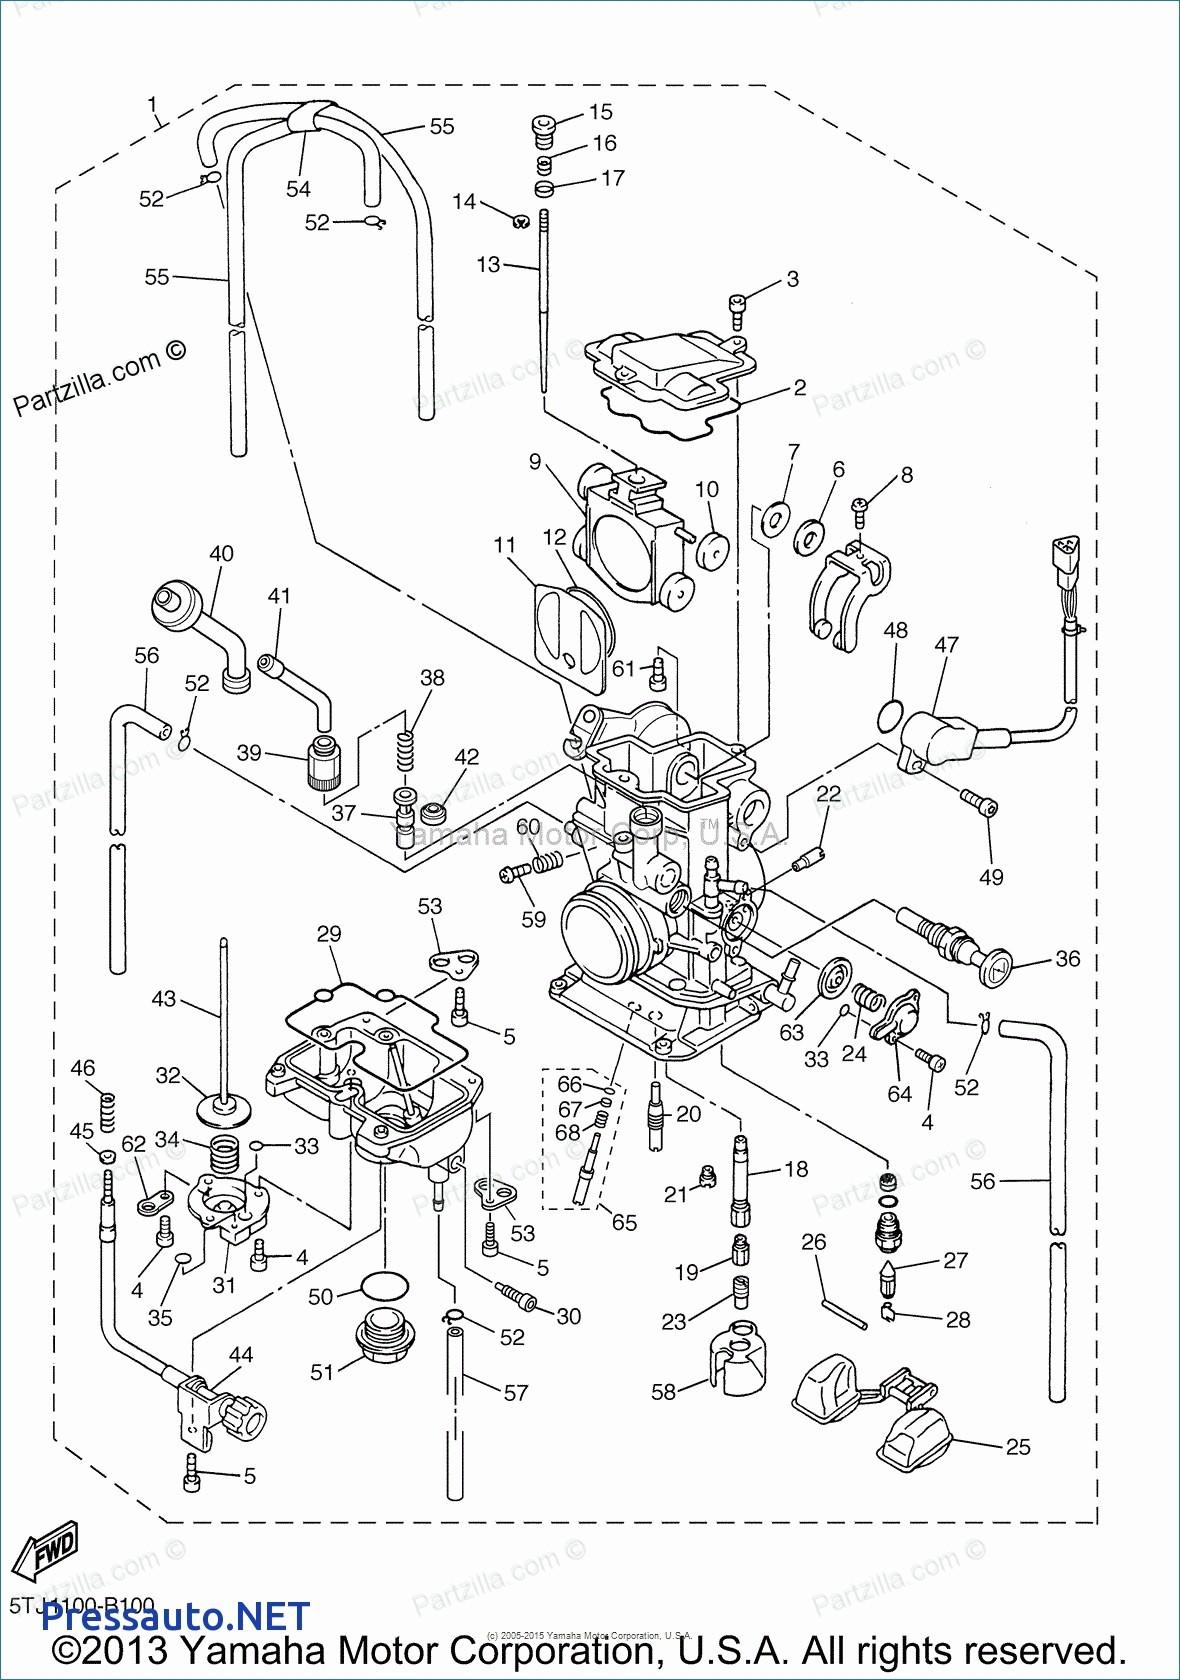 05 Yfz 450 Wiring Diagram